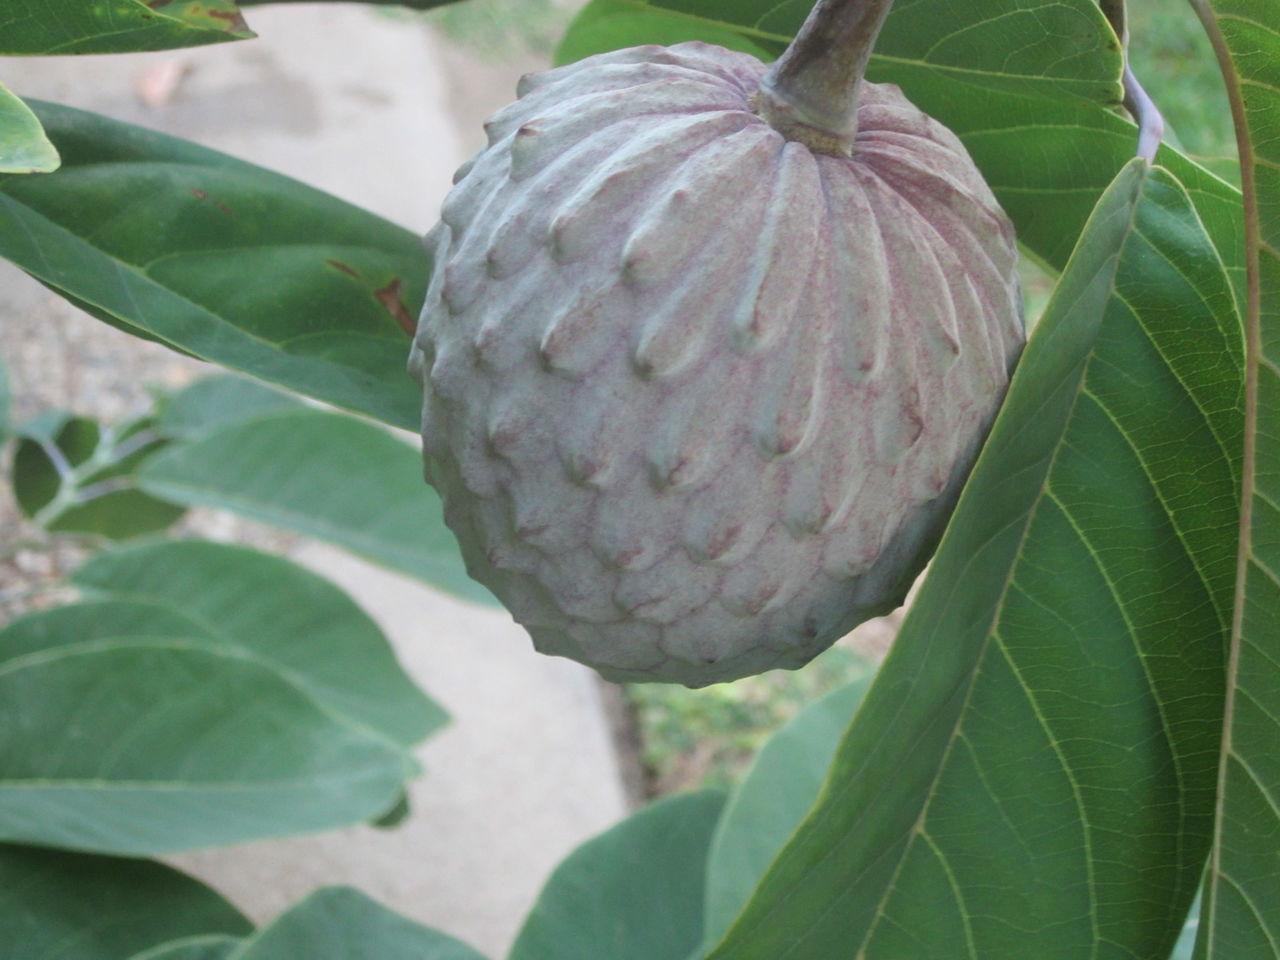 İLİMA MEYVESİ (Annona diversifolia)   TROPİKAL MEYVELER